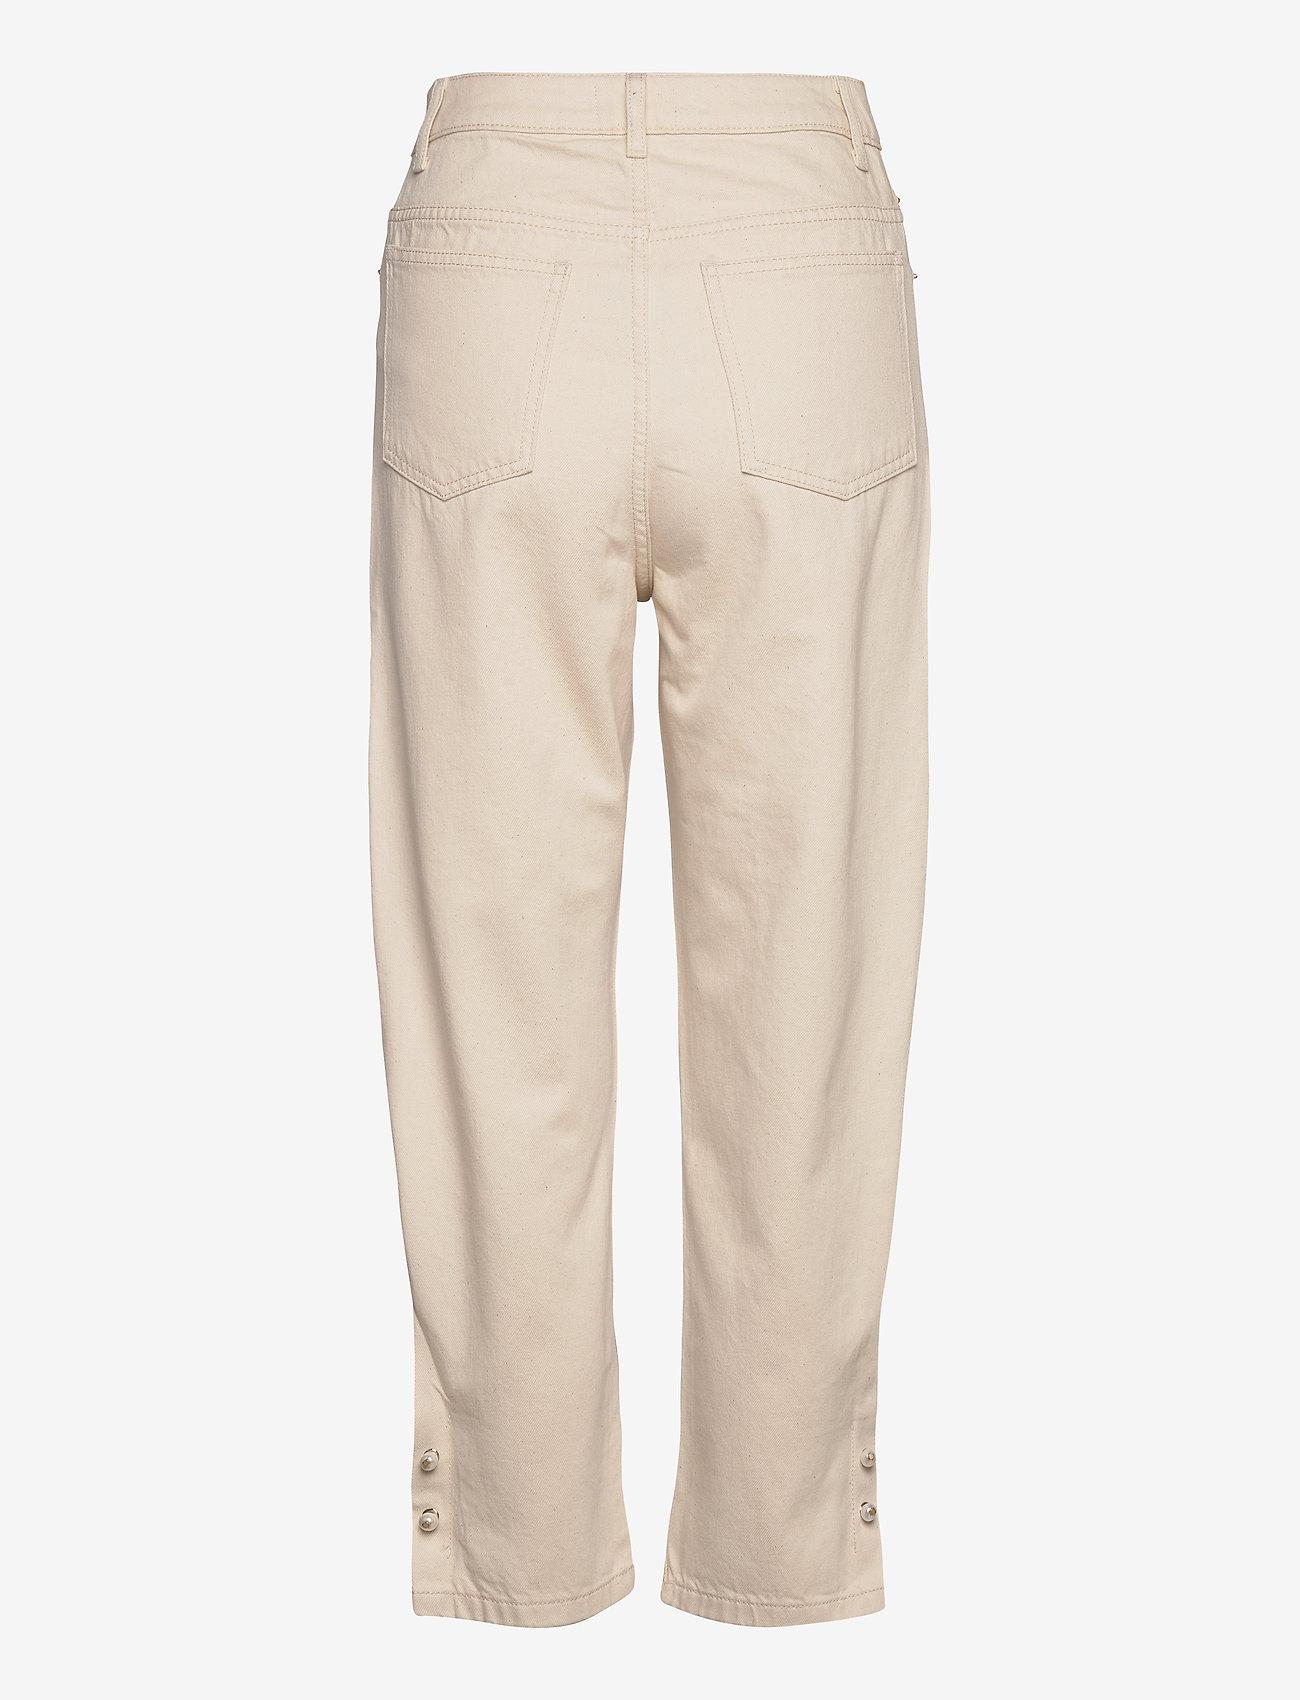 Mother of Pearl - KYRA ECRU DENIM JEANS WITH PEARL BAR CUFF - straight jeans - ecru - 1